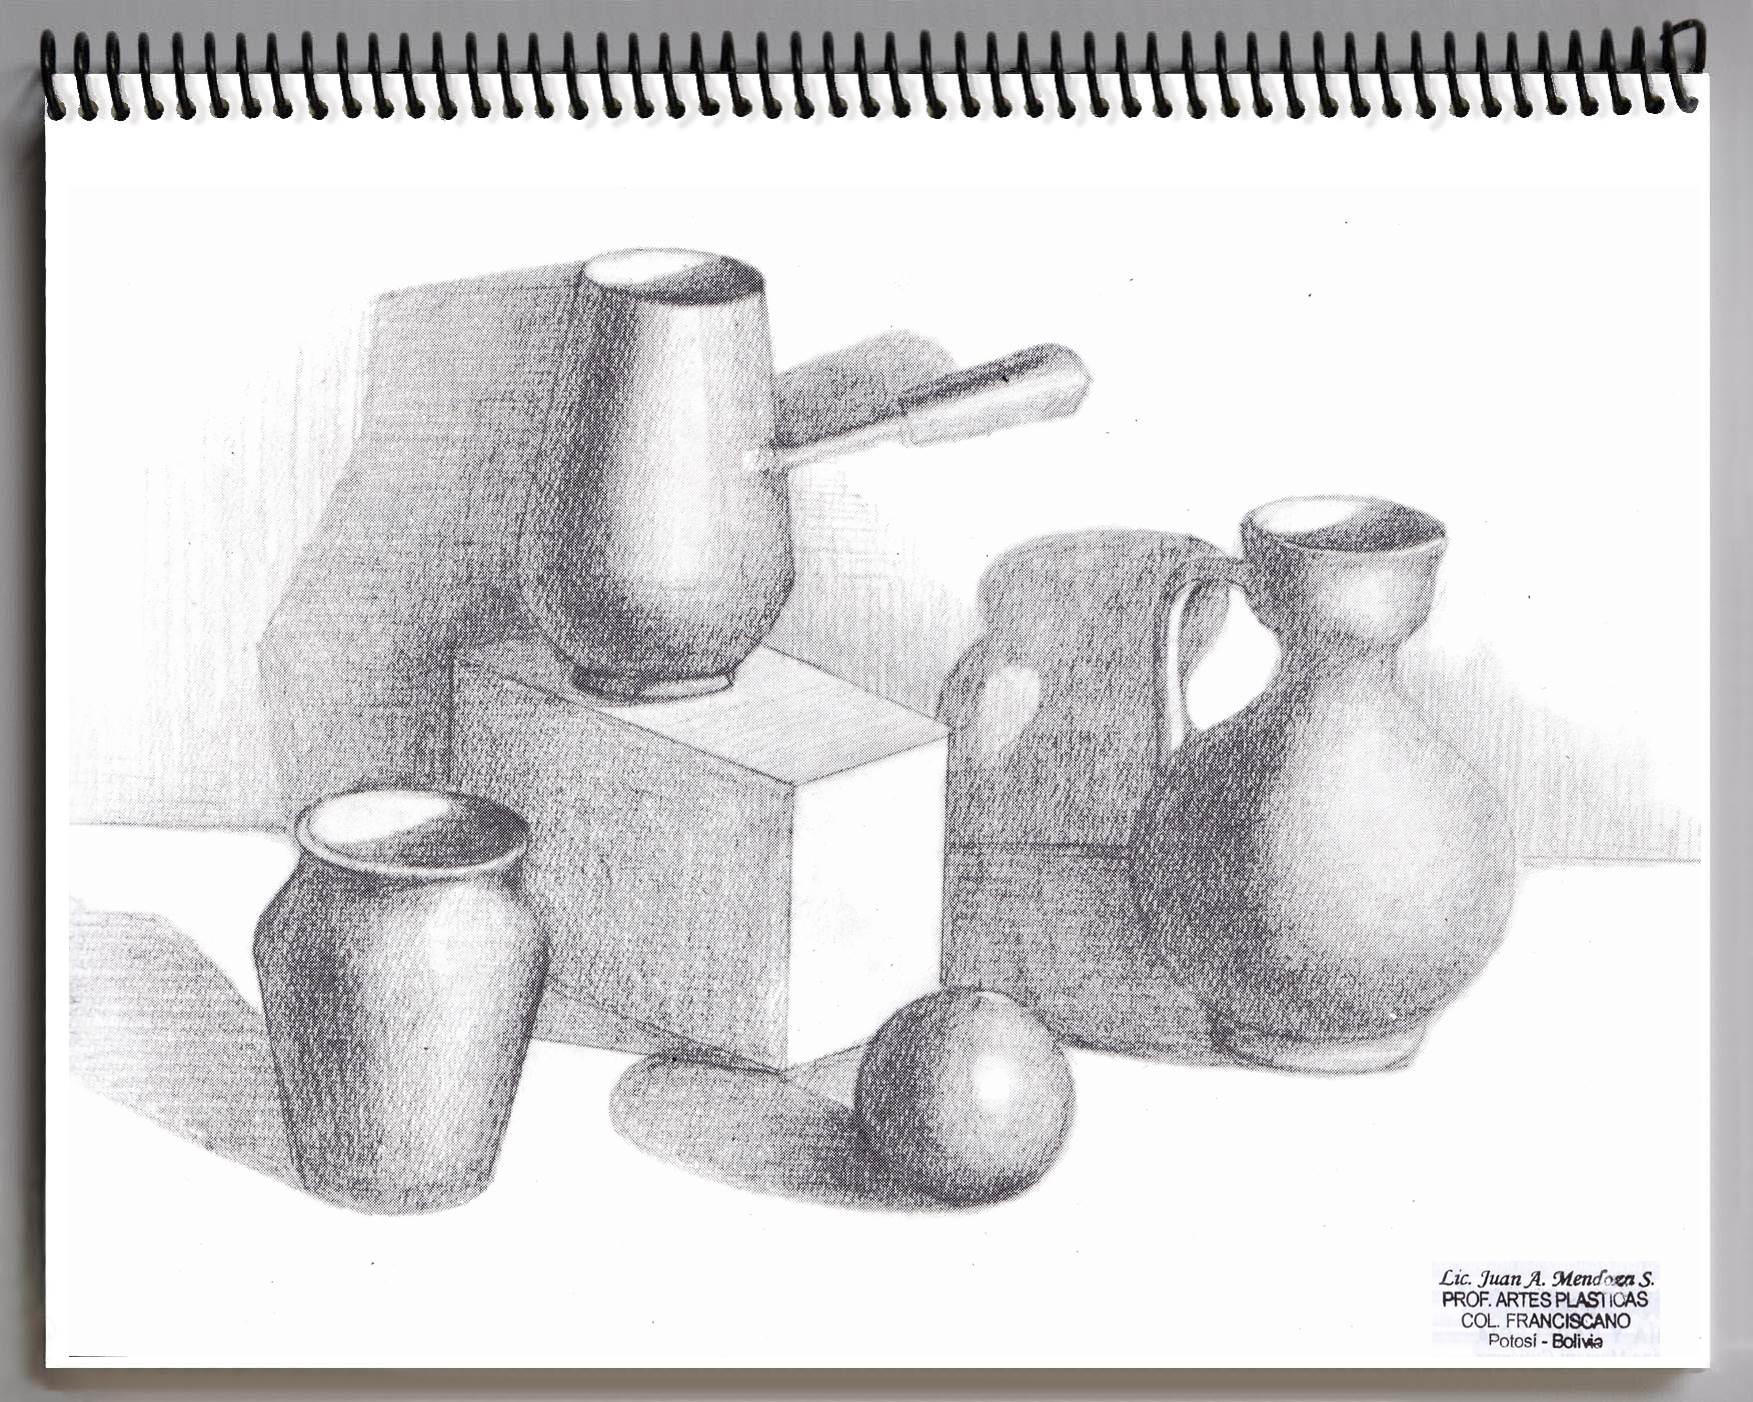 Juan mendoza pr cticas de dibujo art stico 1ro - Laminas de dibujo artistico ...